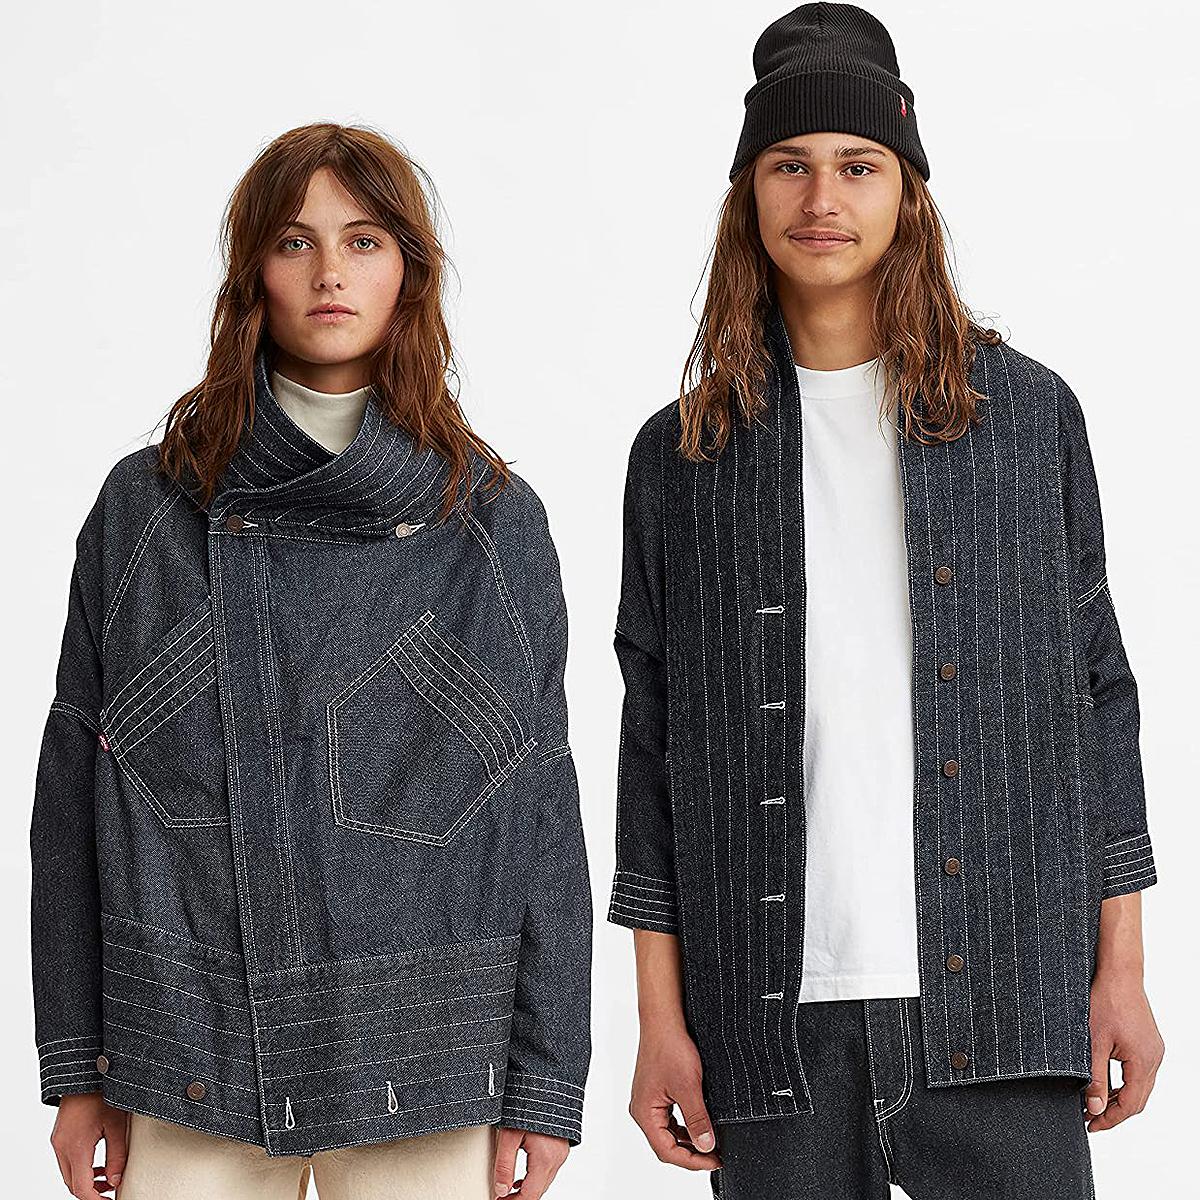 making-the-cut-amazon-levis-jacket